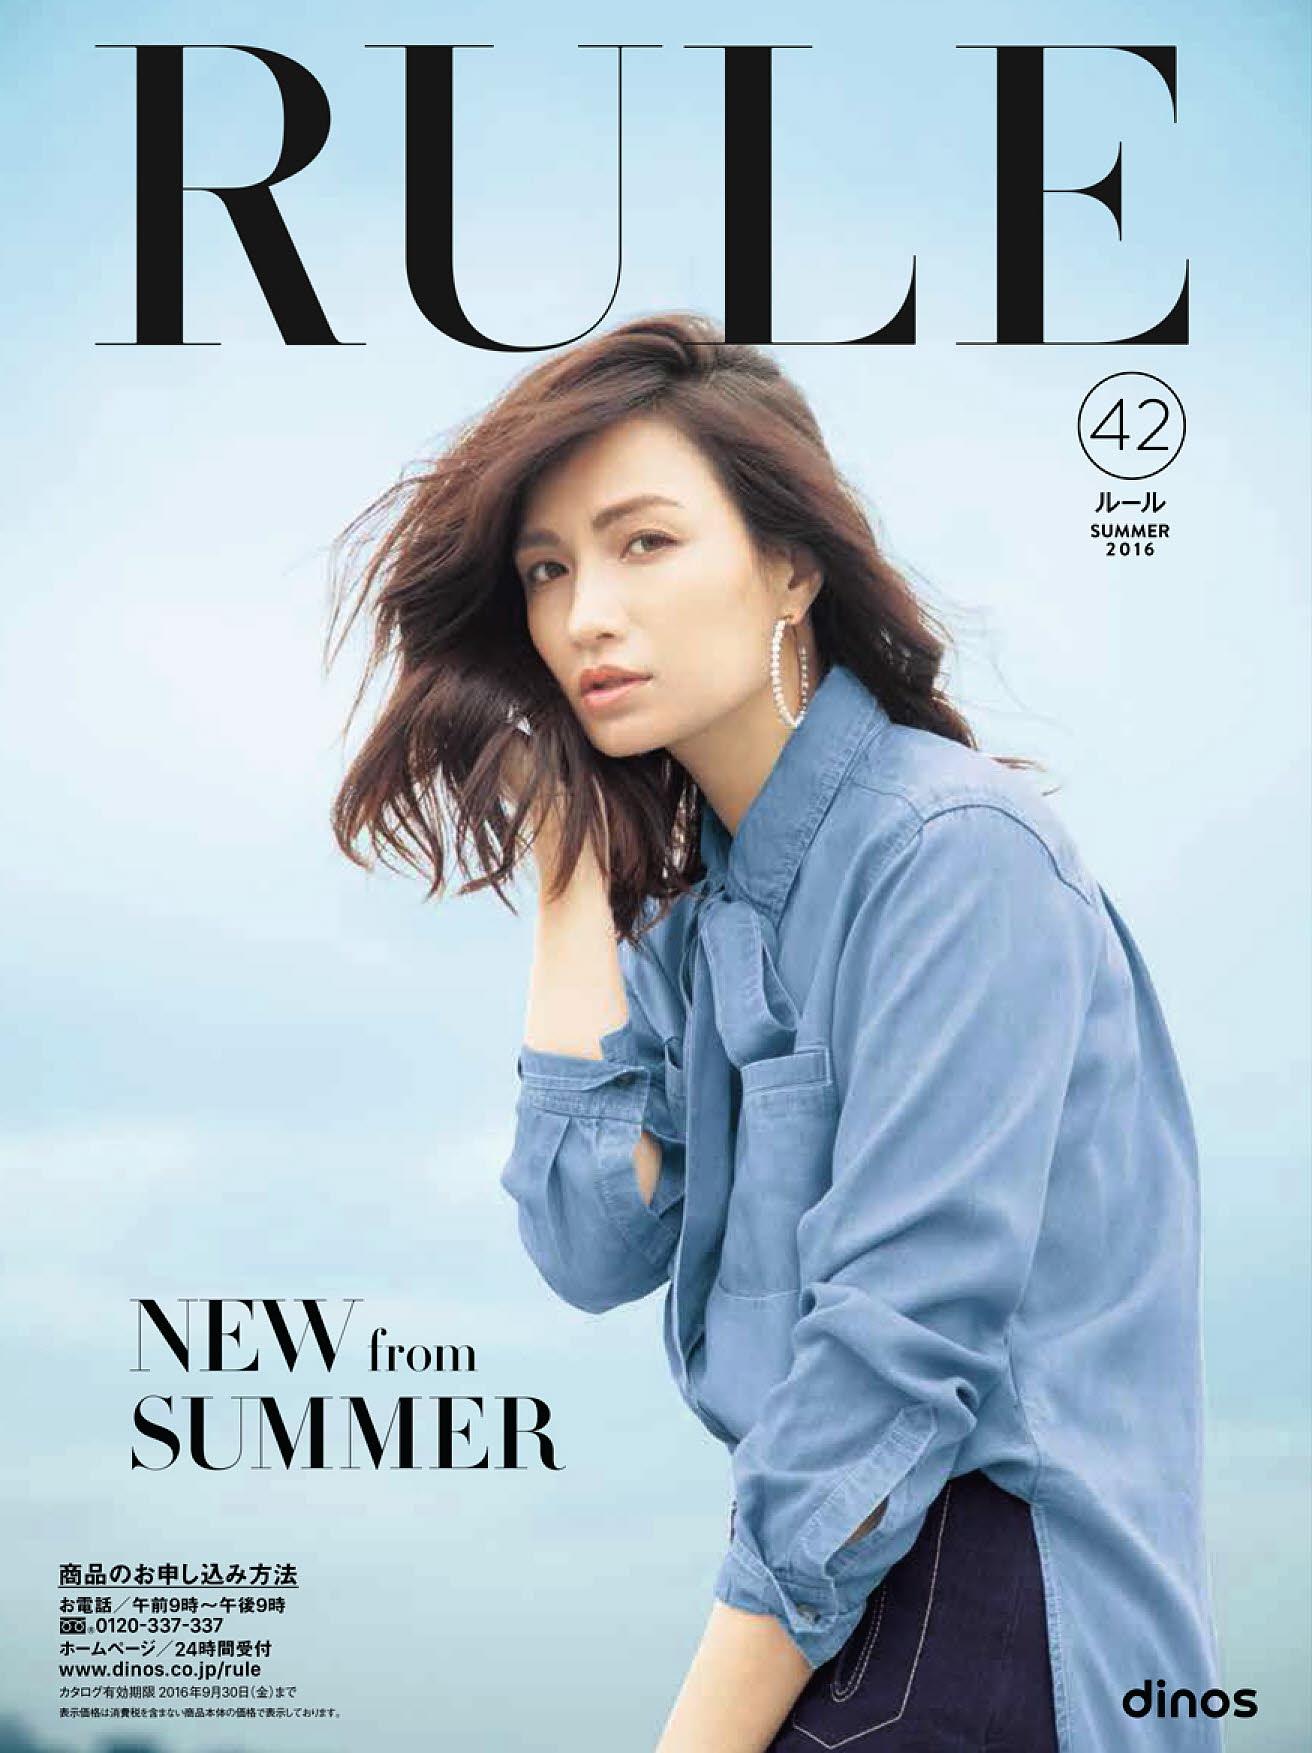 f7cb36c93d9ab ファッションブランド『RULE』2016夏コレクションを発行|株式会社ディノス・セシールのプレスリリース